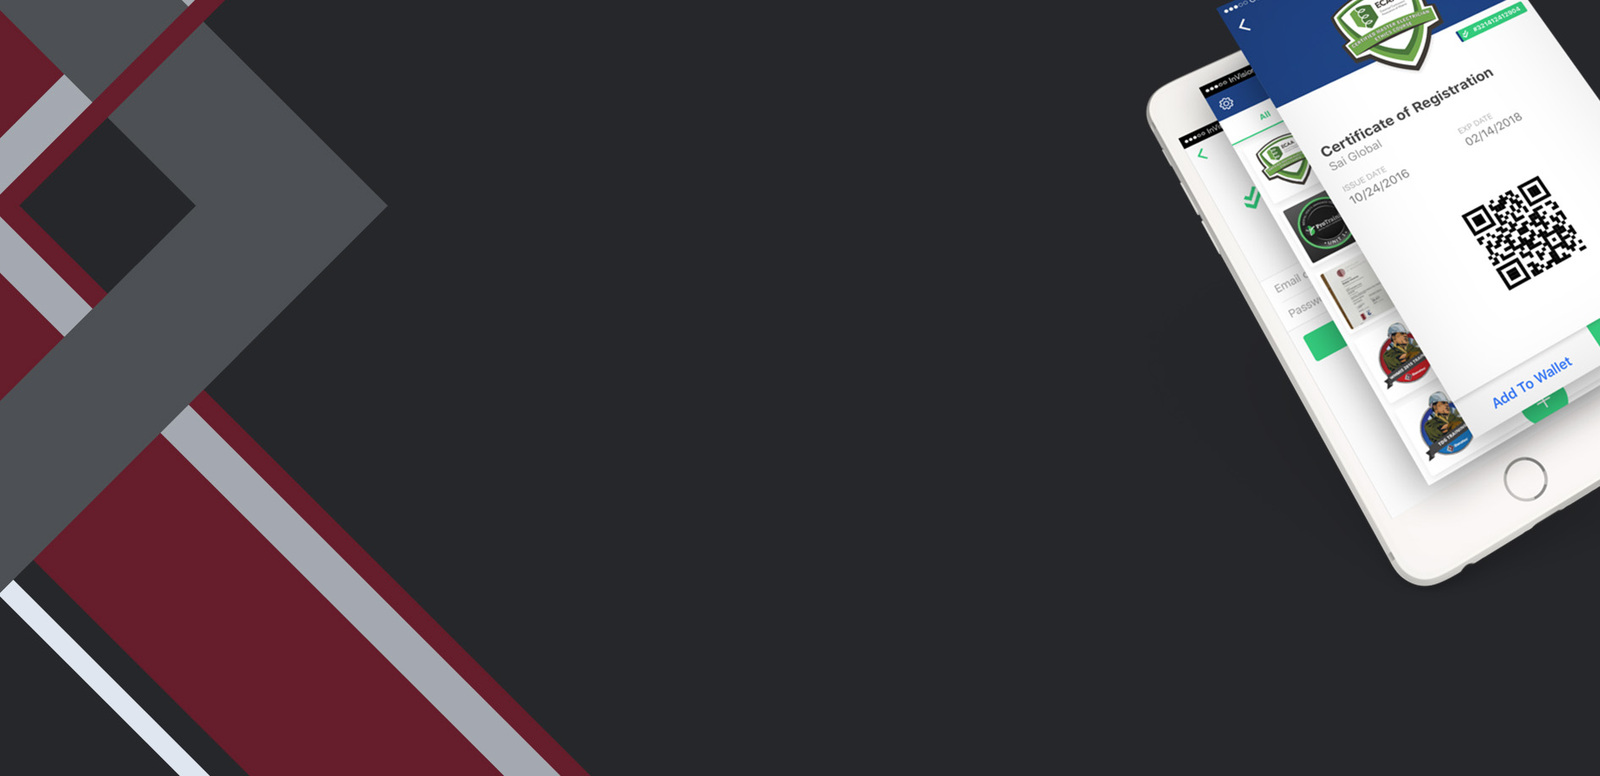 danatec-header-credential-app